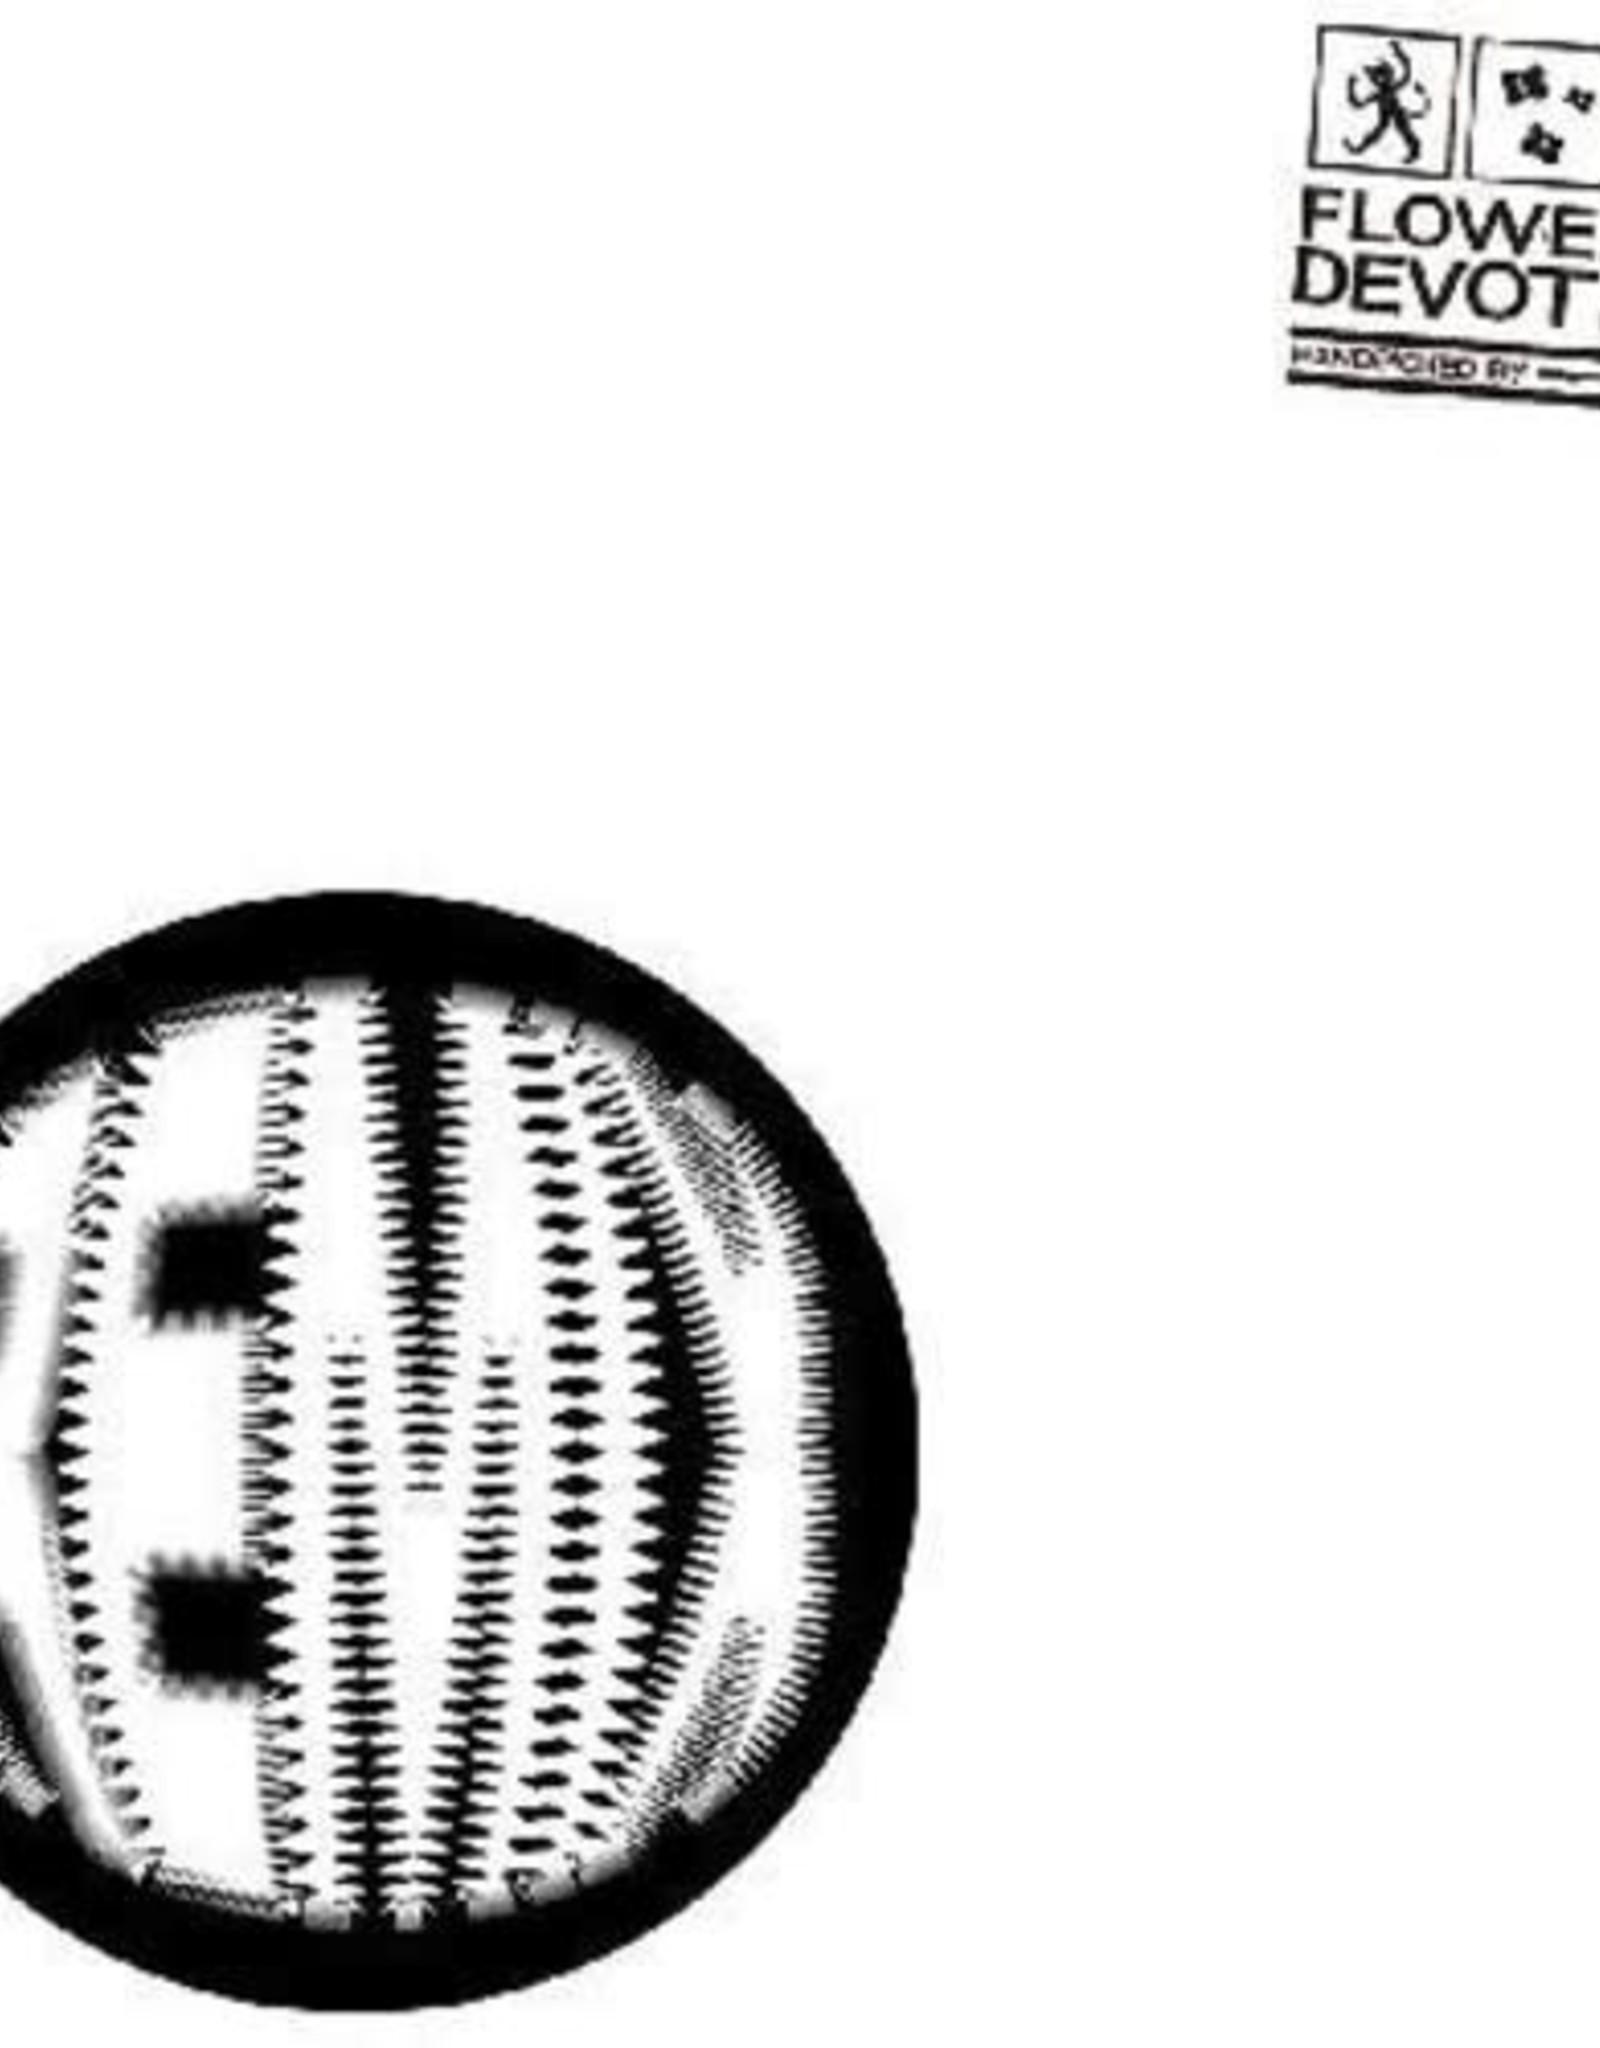 Dehd - Flower Of Devotion Remixed (Colored Vinyl, Pink)